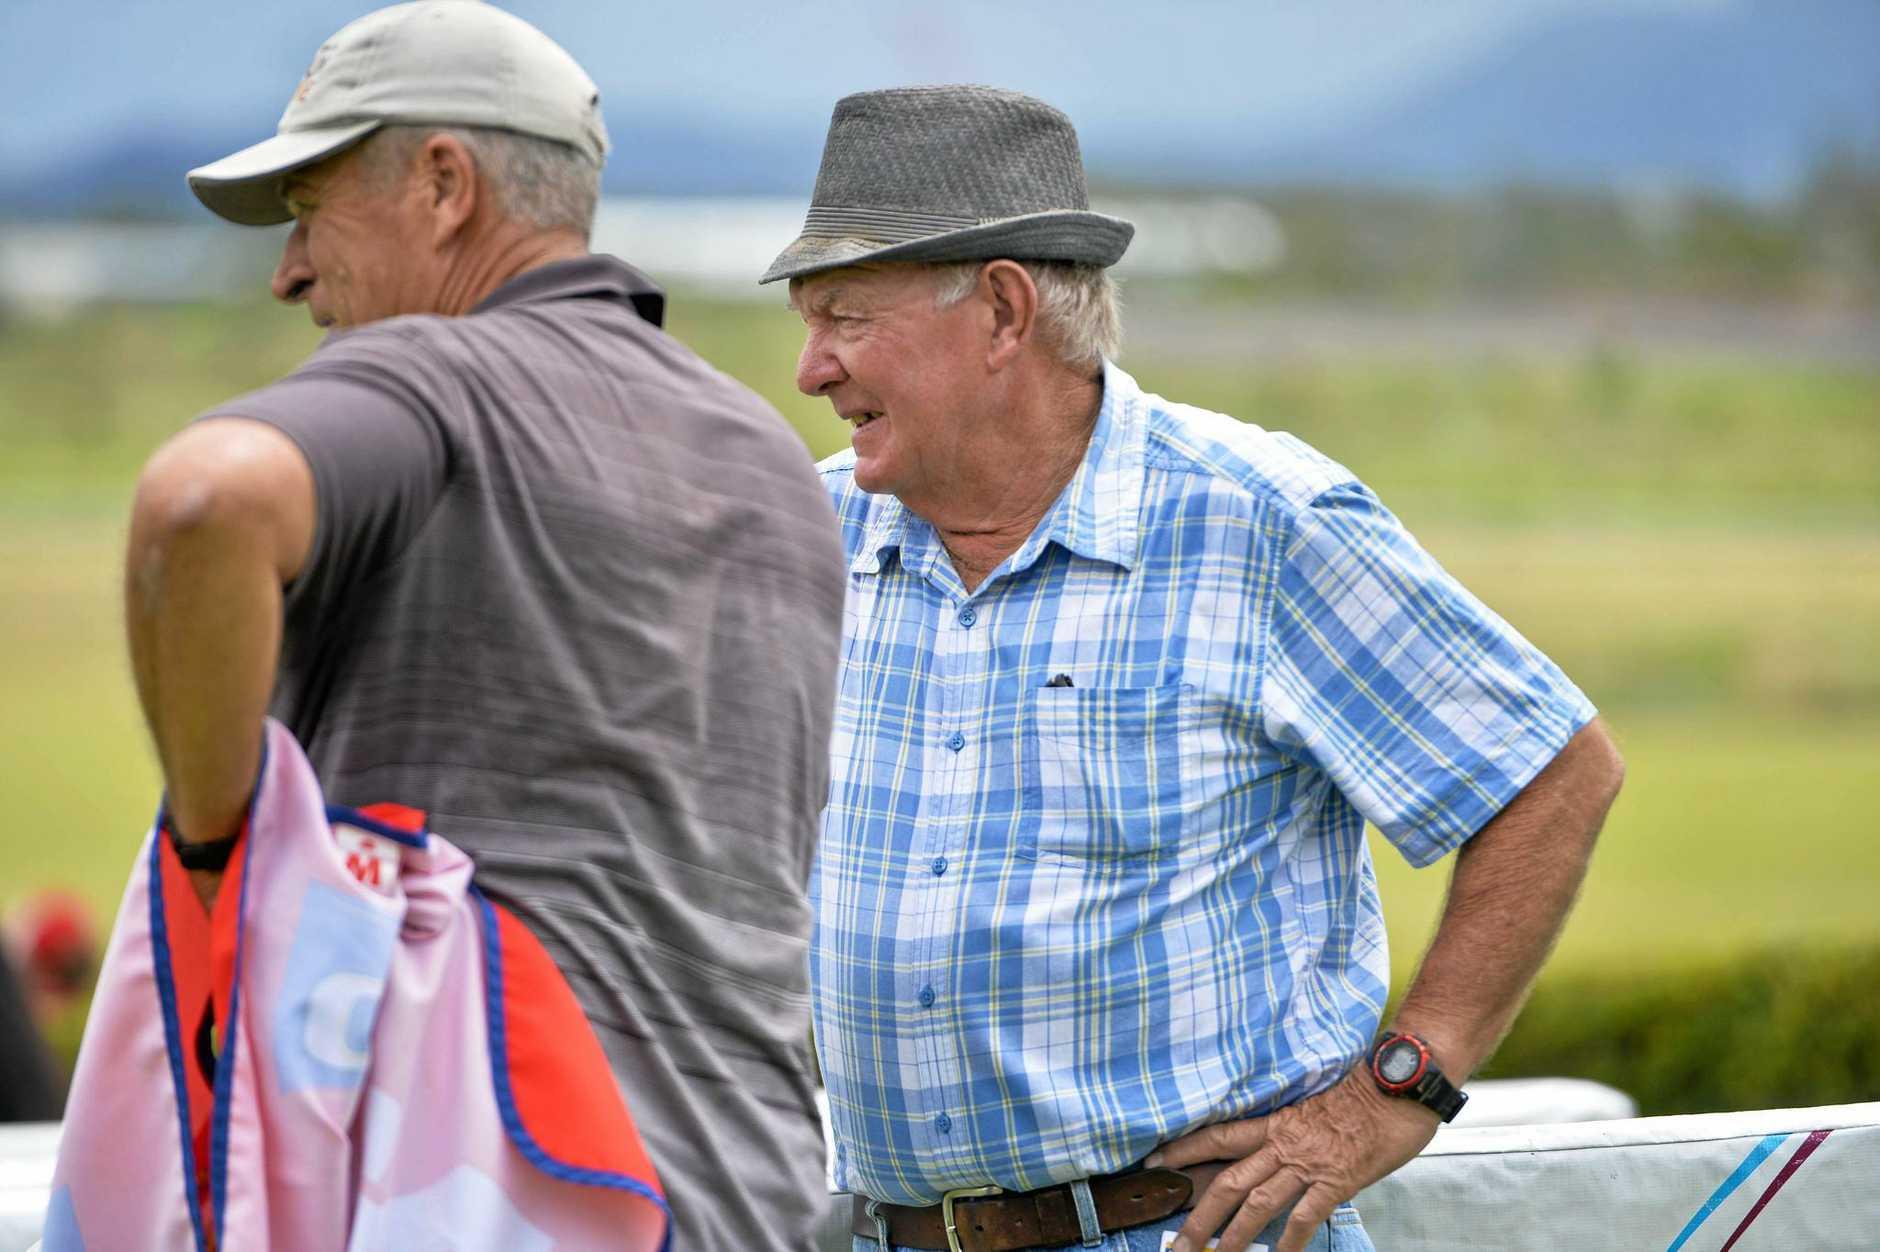 Trainer Denis Schultz. - Gladstone Horse Racing. Photo Paul Braven / The Observer